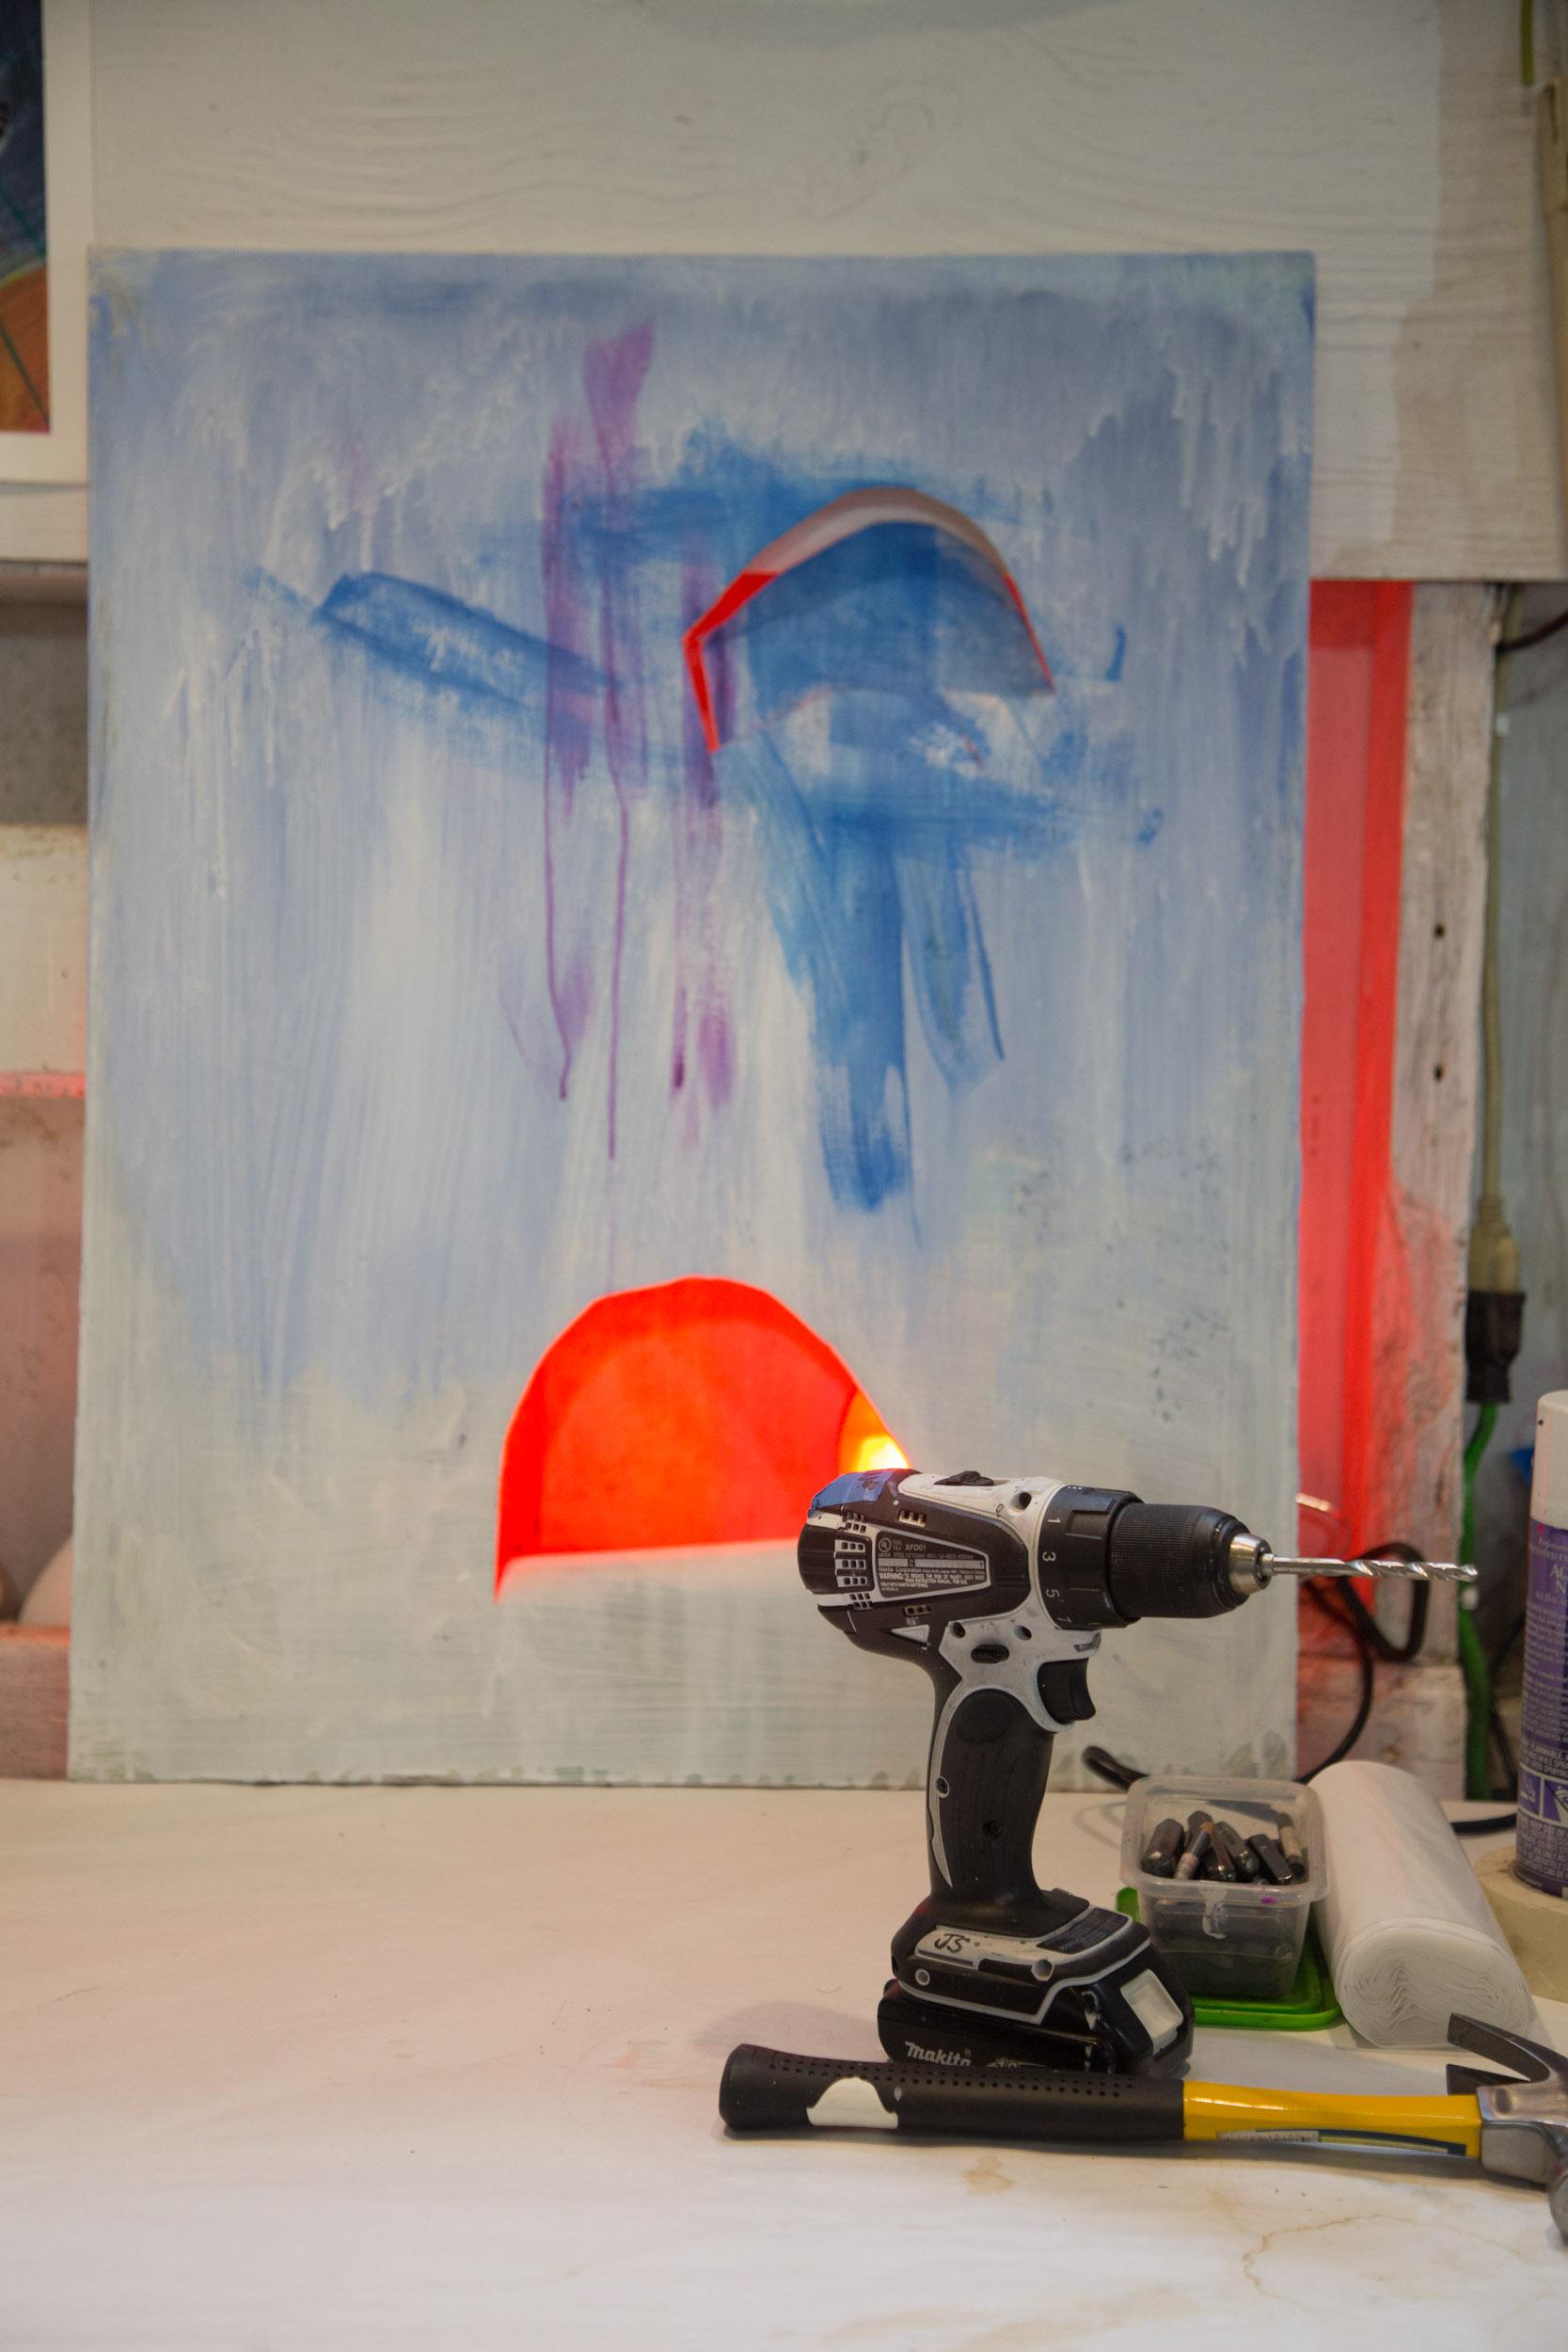 wassaic-project-artist-jen-shepard-2018-09-13-13-04-18.jpg